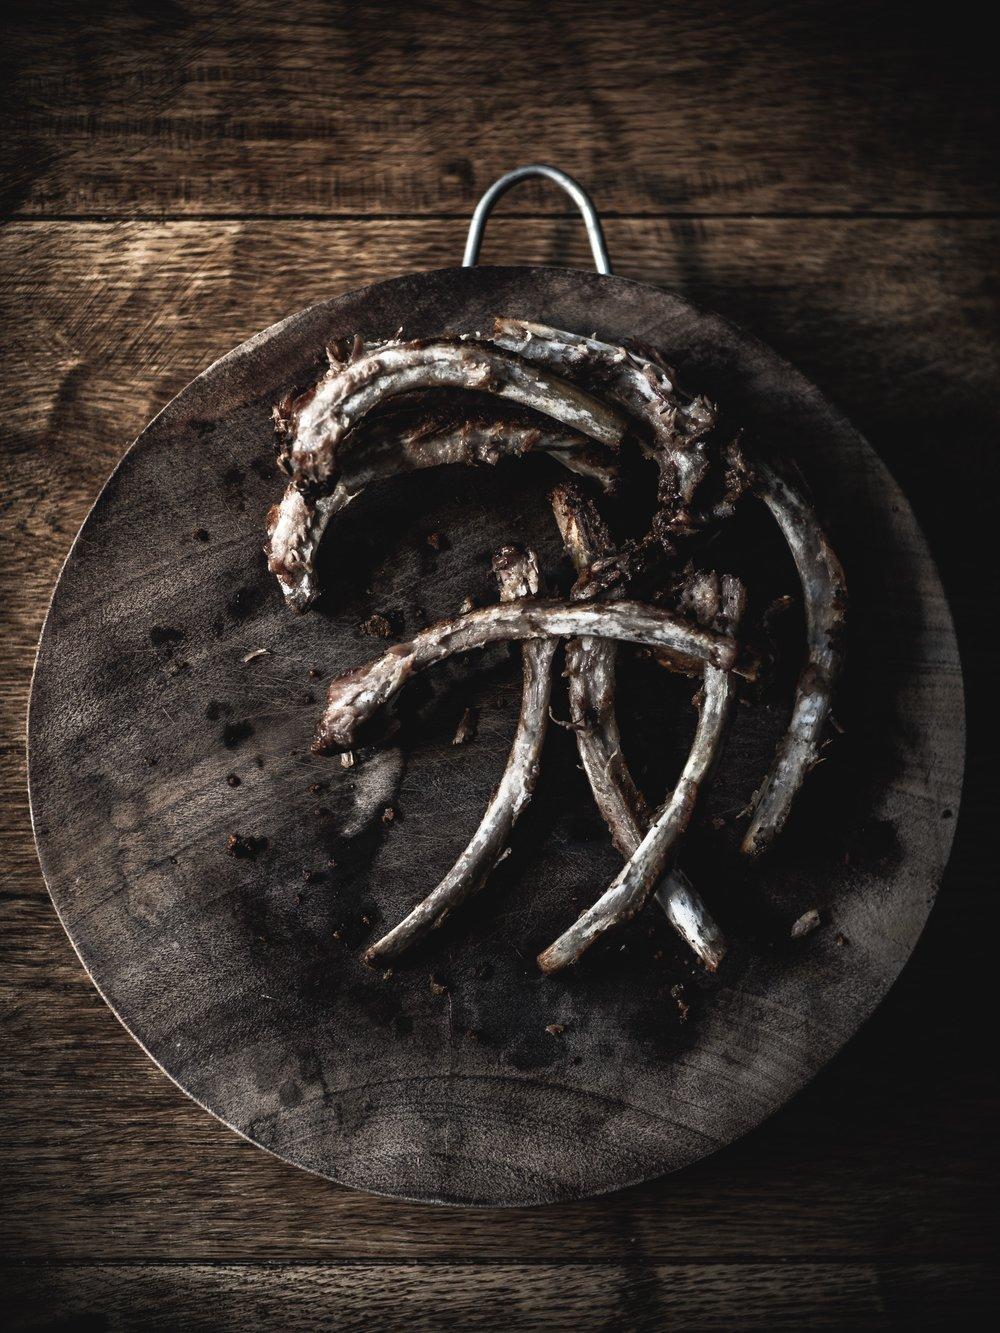 Carnivore diet baby back pork ribs bones aftermath